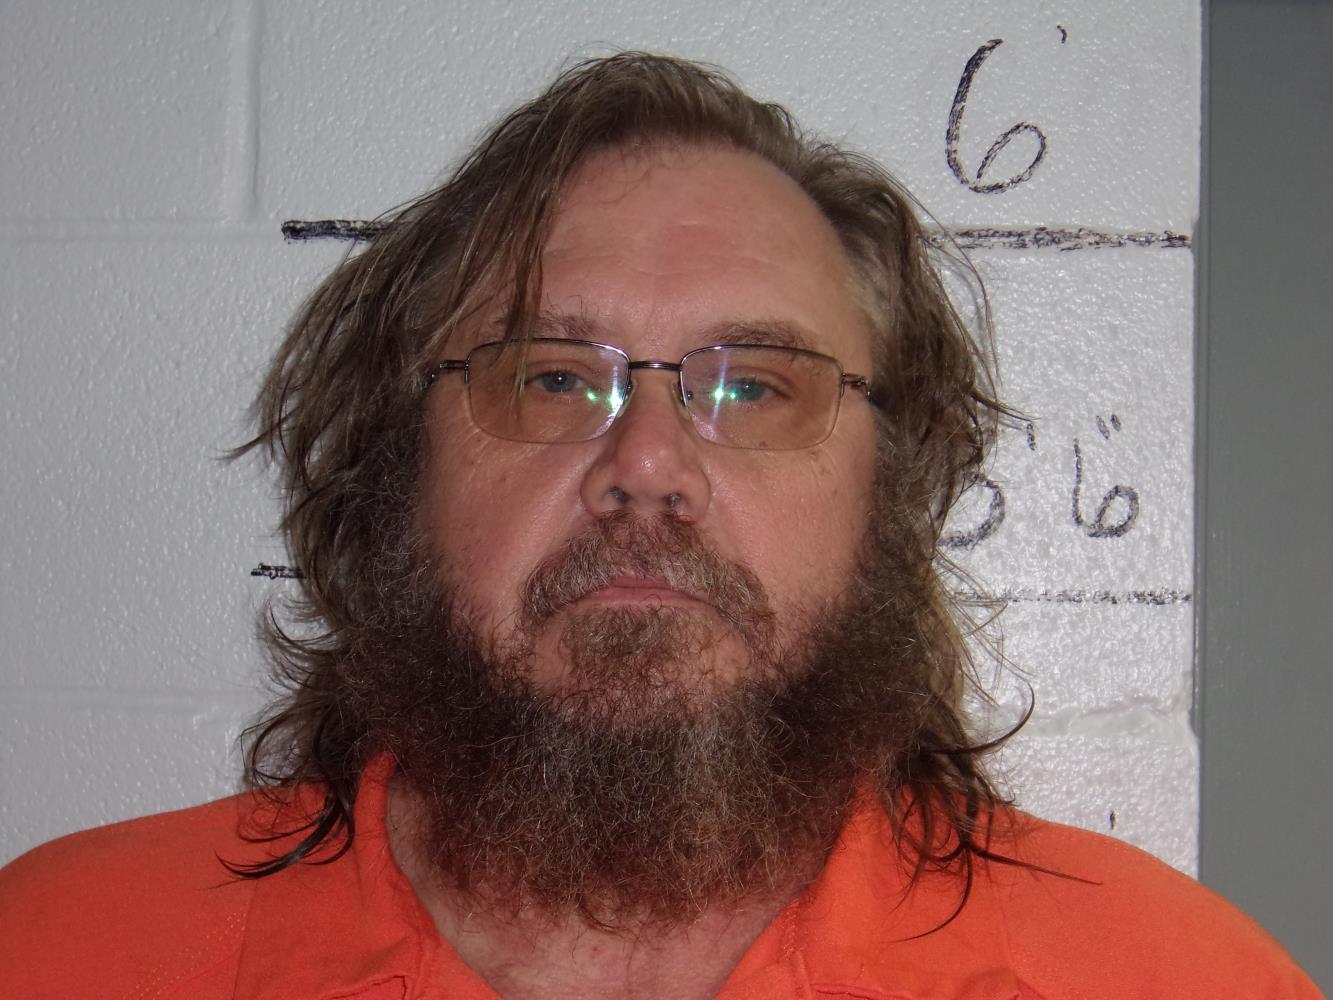 mugshot of Defon Jesse Mergel Sr.